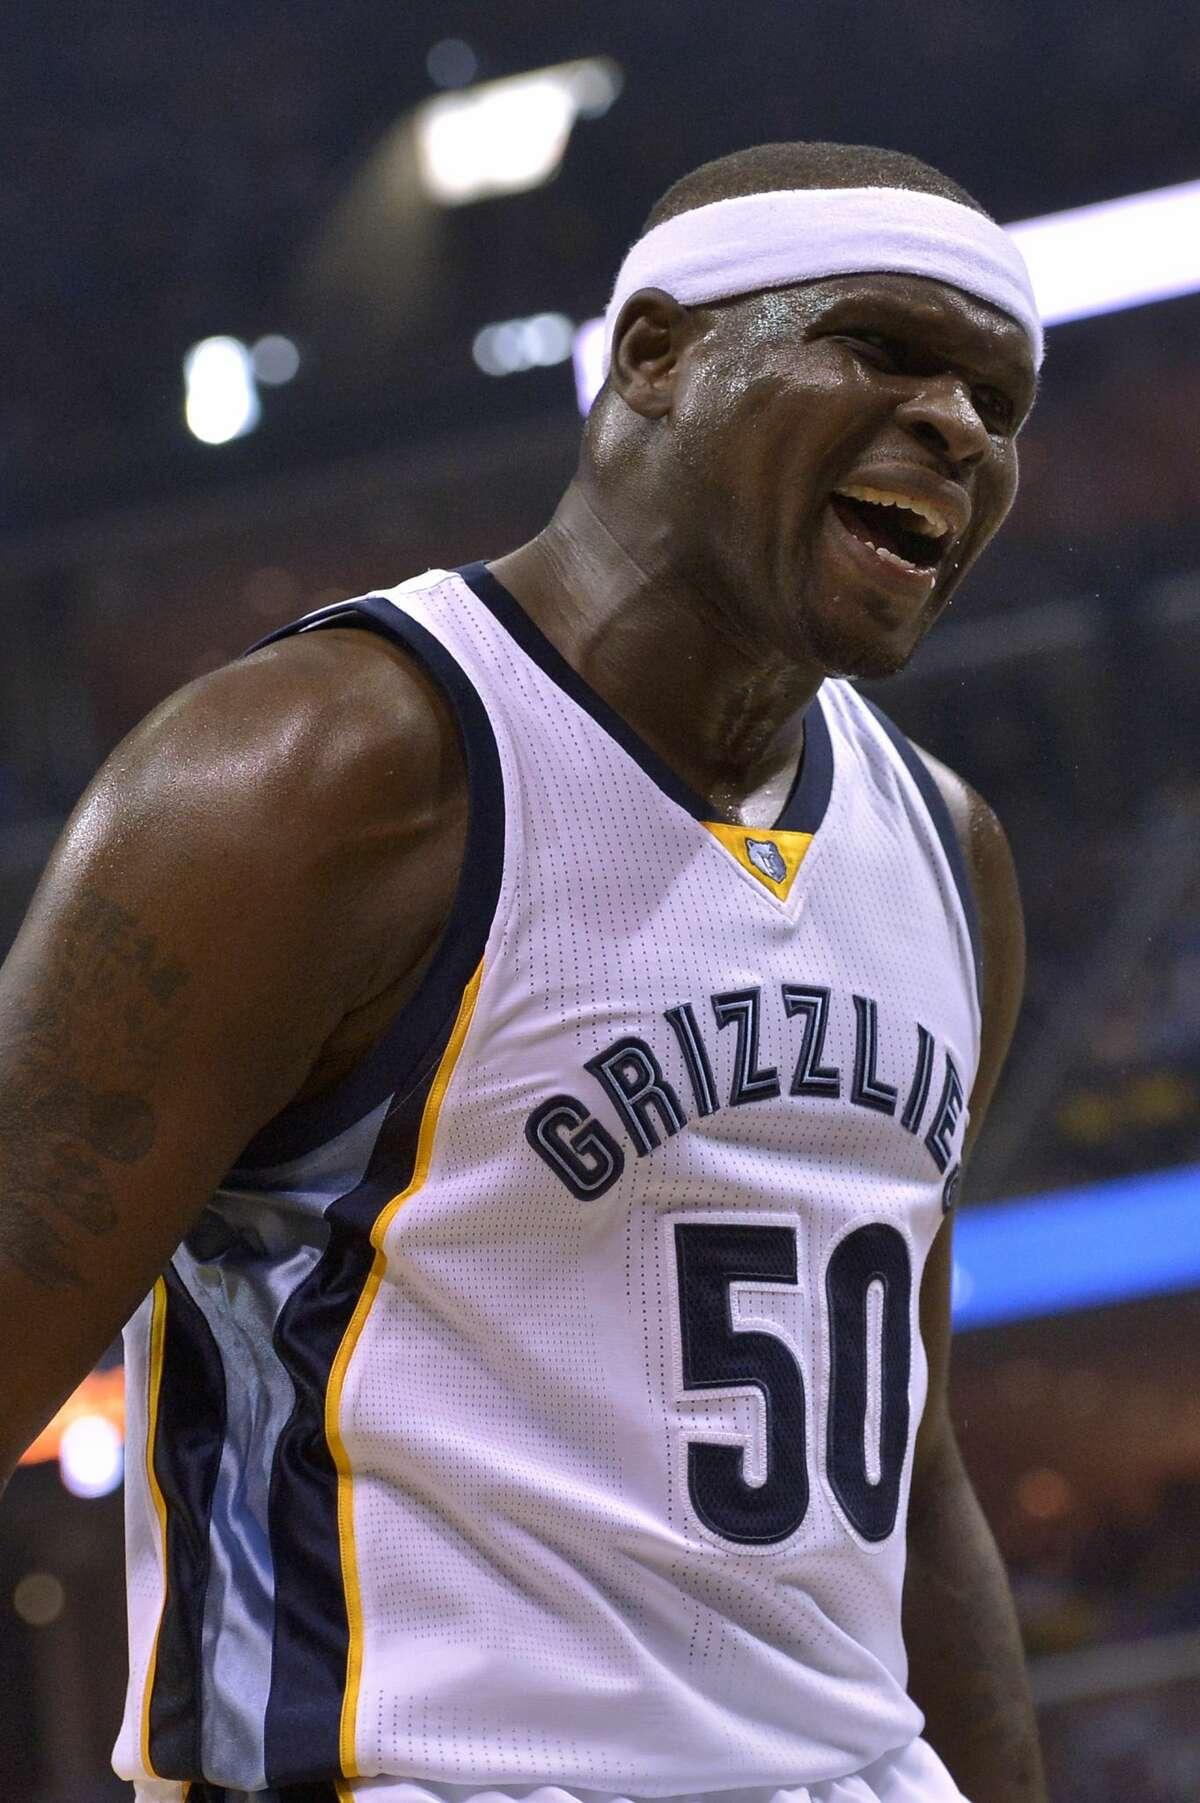 Memphis Grizzlies forward Zach Randolph (50) reacts during the first half of Game 4 in an NBA basketball first-round playoff series against the San Antonio Spurs, Saturday, April 22, 2017, in Memphis, Tenn. (AP Photo/Brandon Dill)